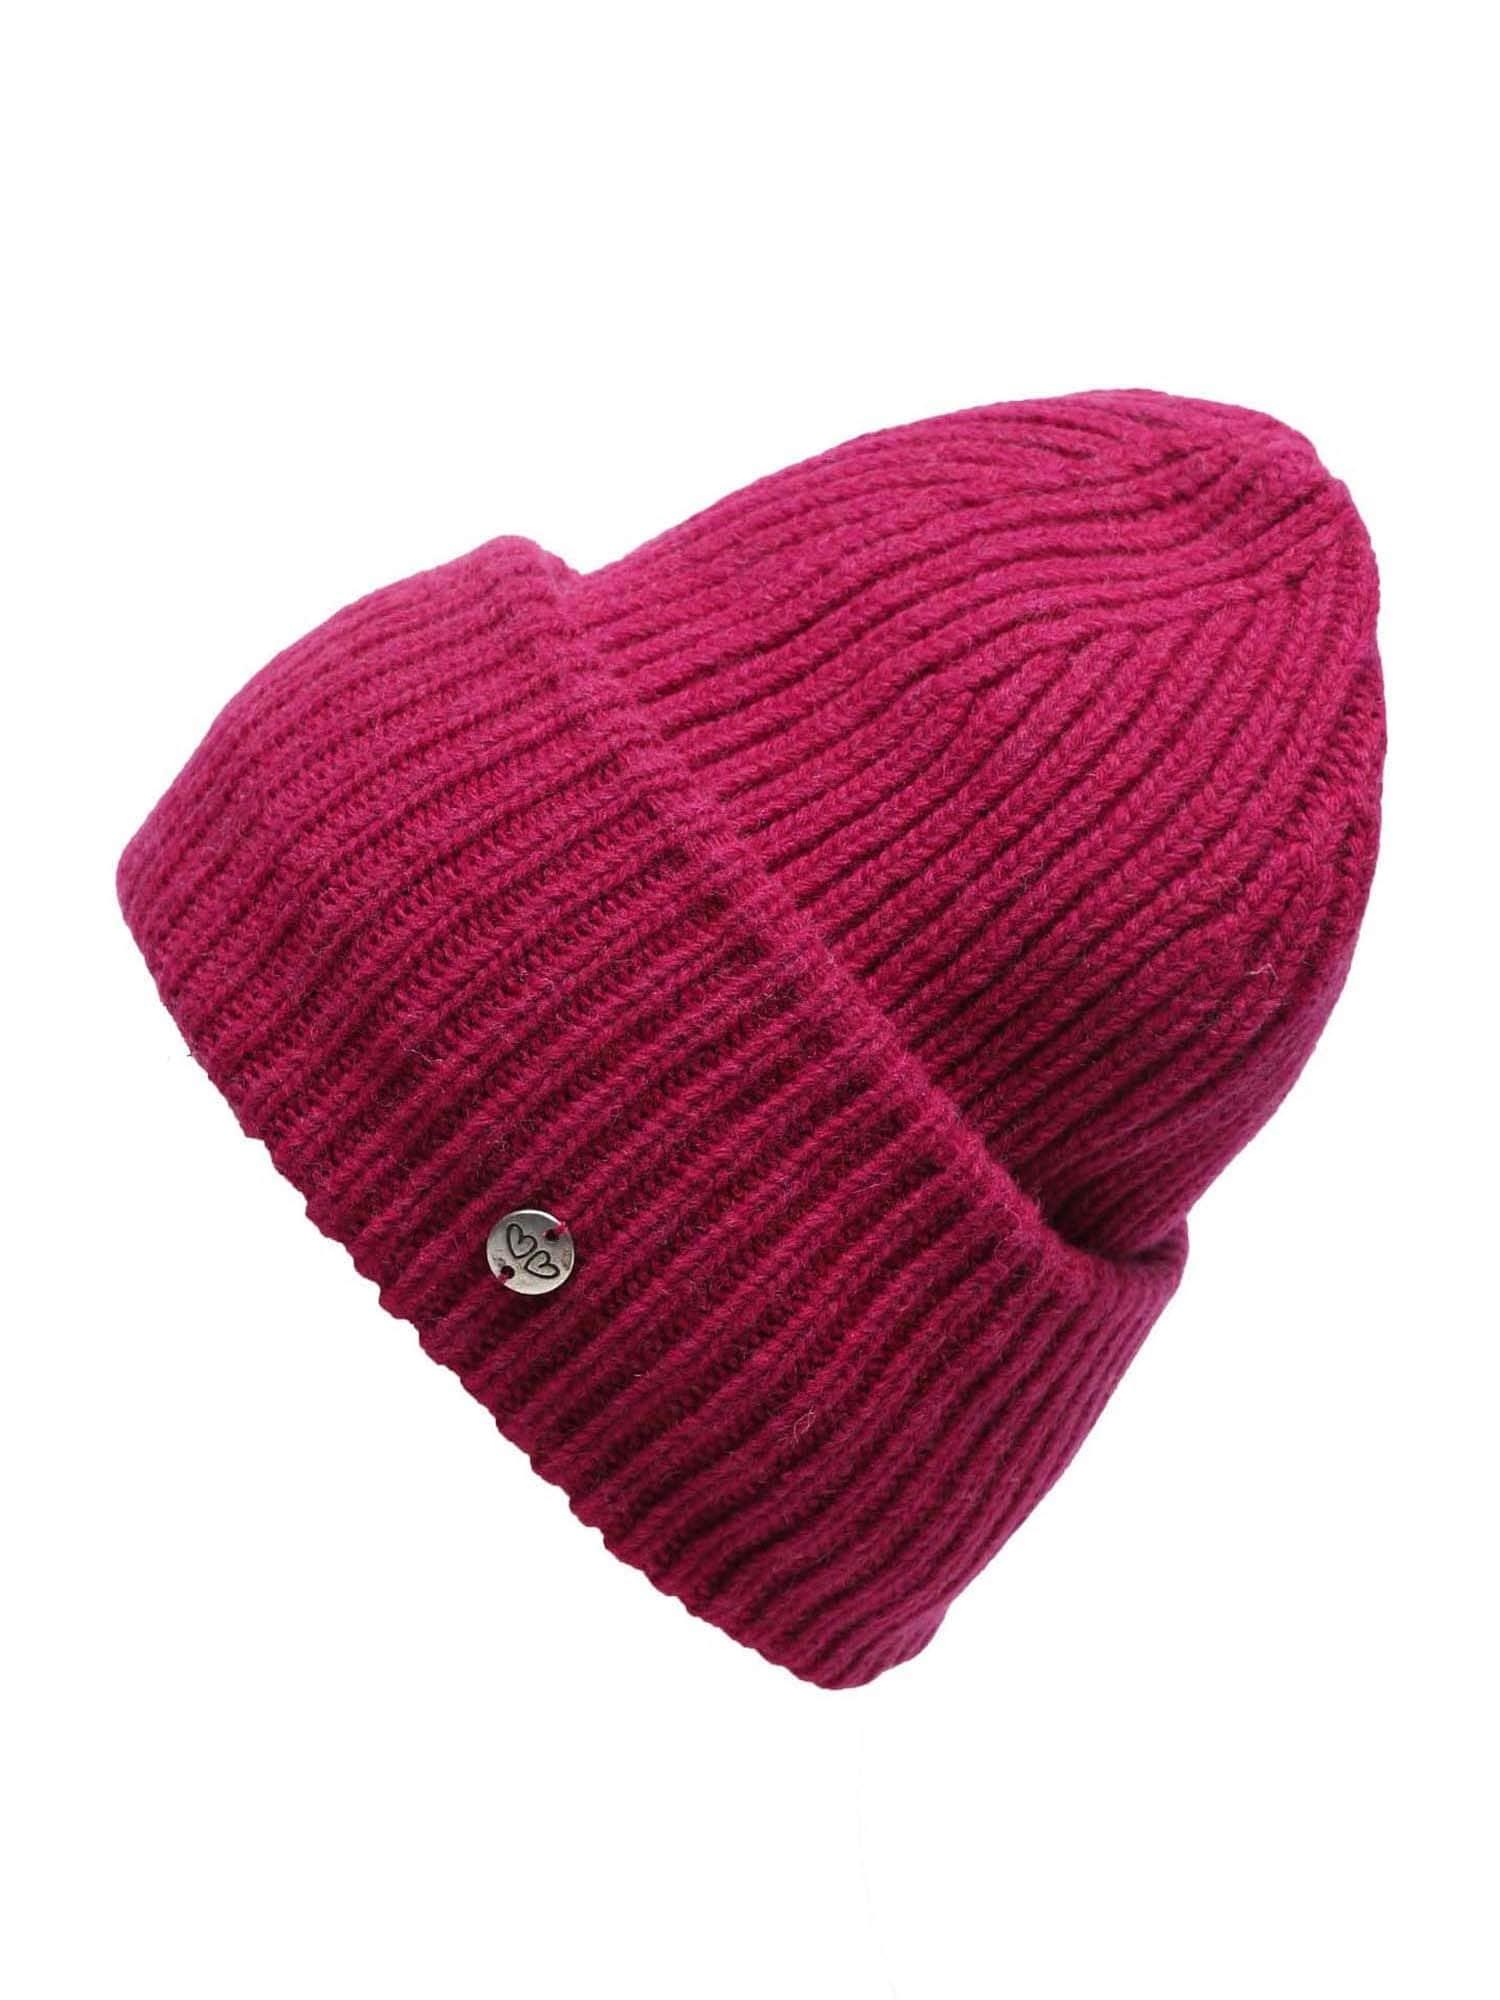 Zwillingsherz Megzta kepurė raudona